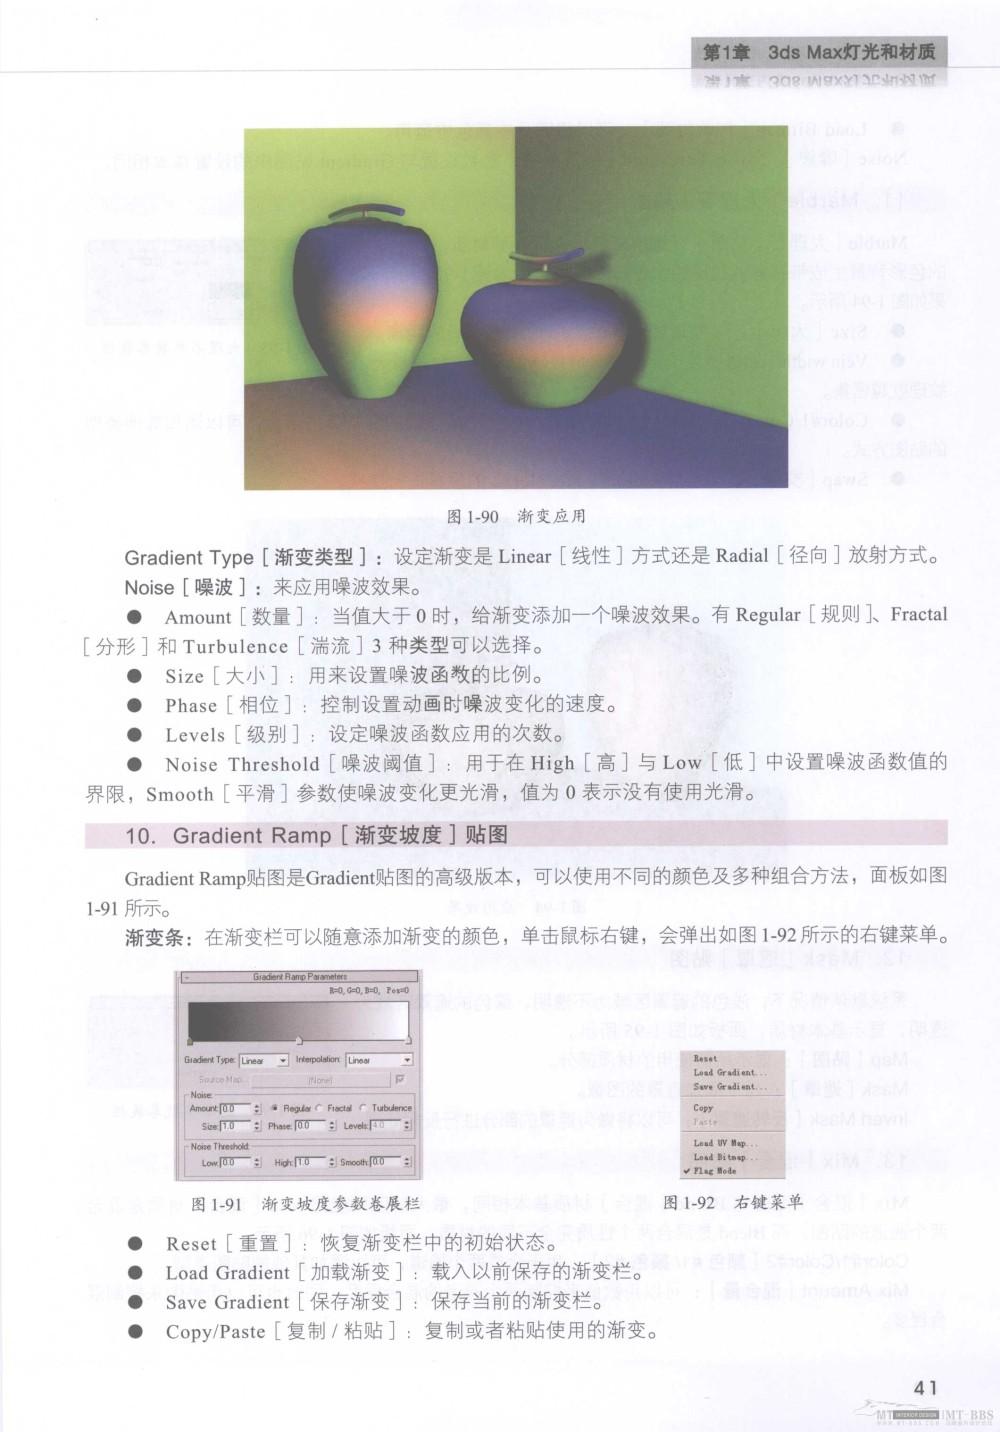 水晶石技法-3ds_Max&VRay室内空间表现_水晶石技法-3ds_Max&VRay室内空间表现_页面_047.jpg